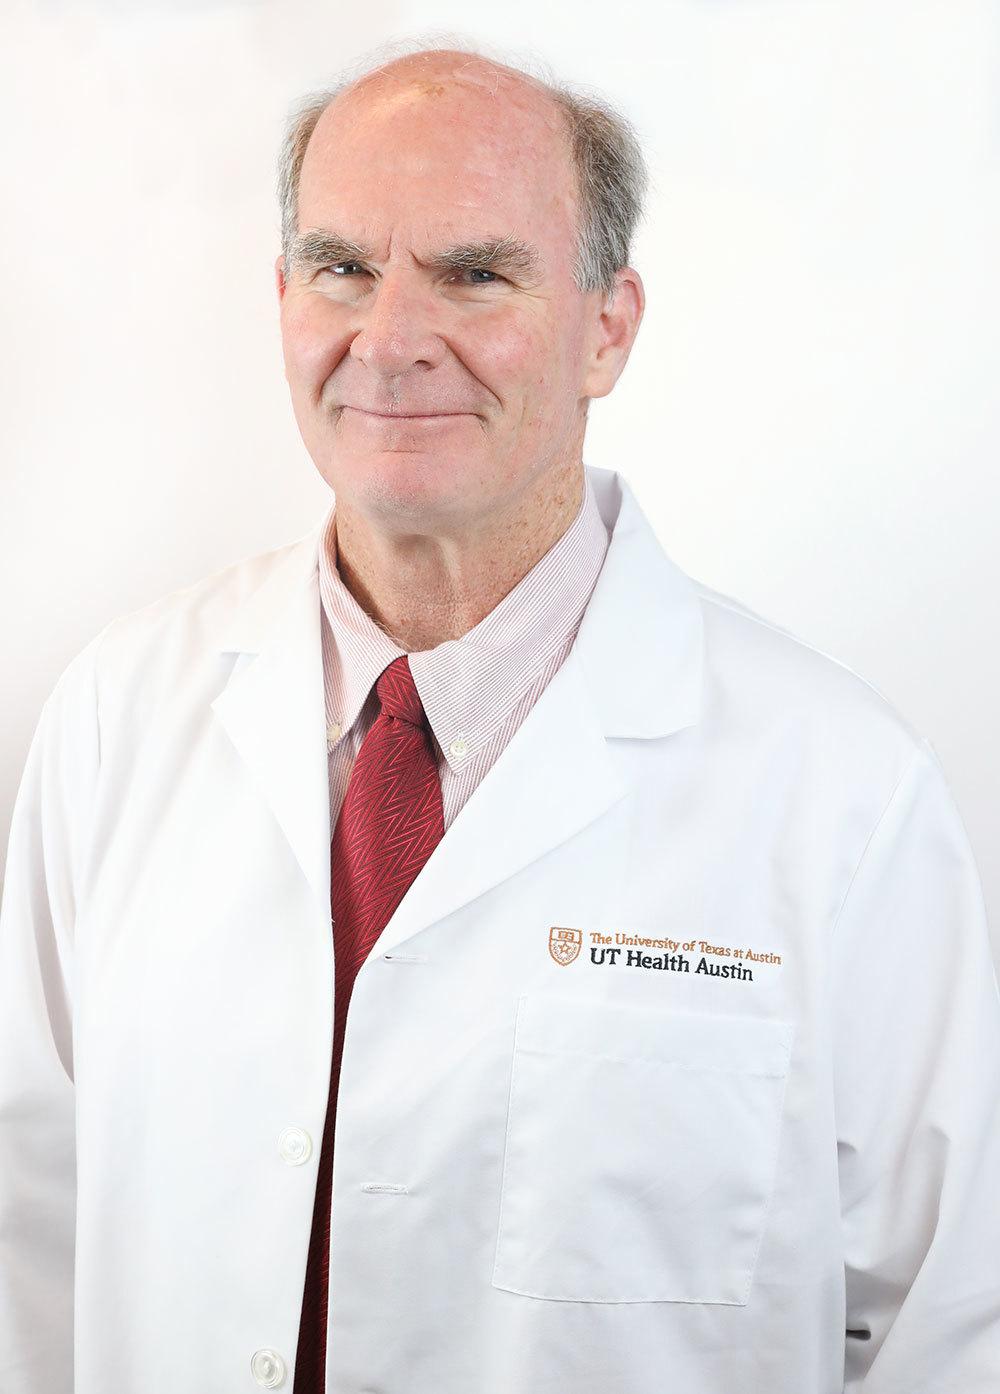 Michael Breen at UT Health Austin